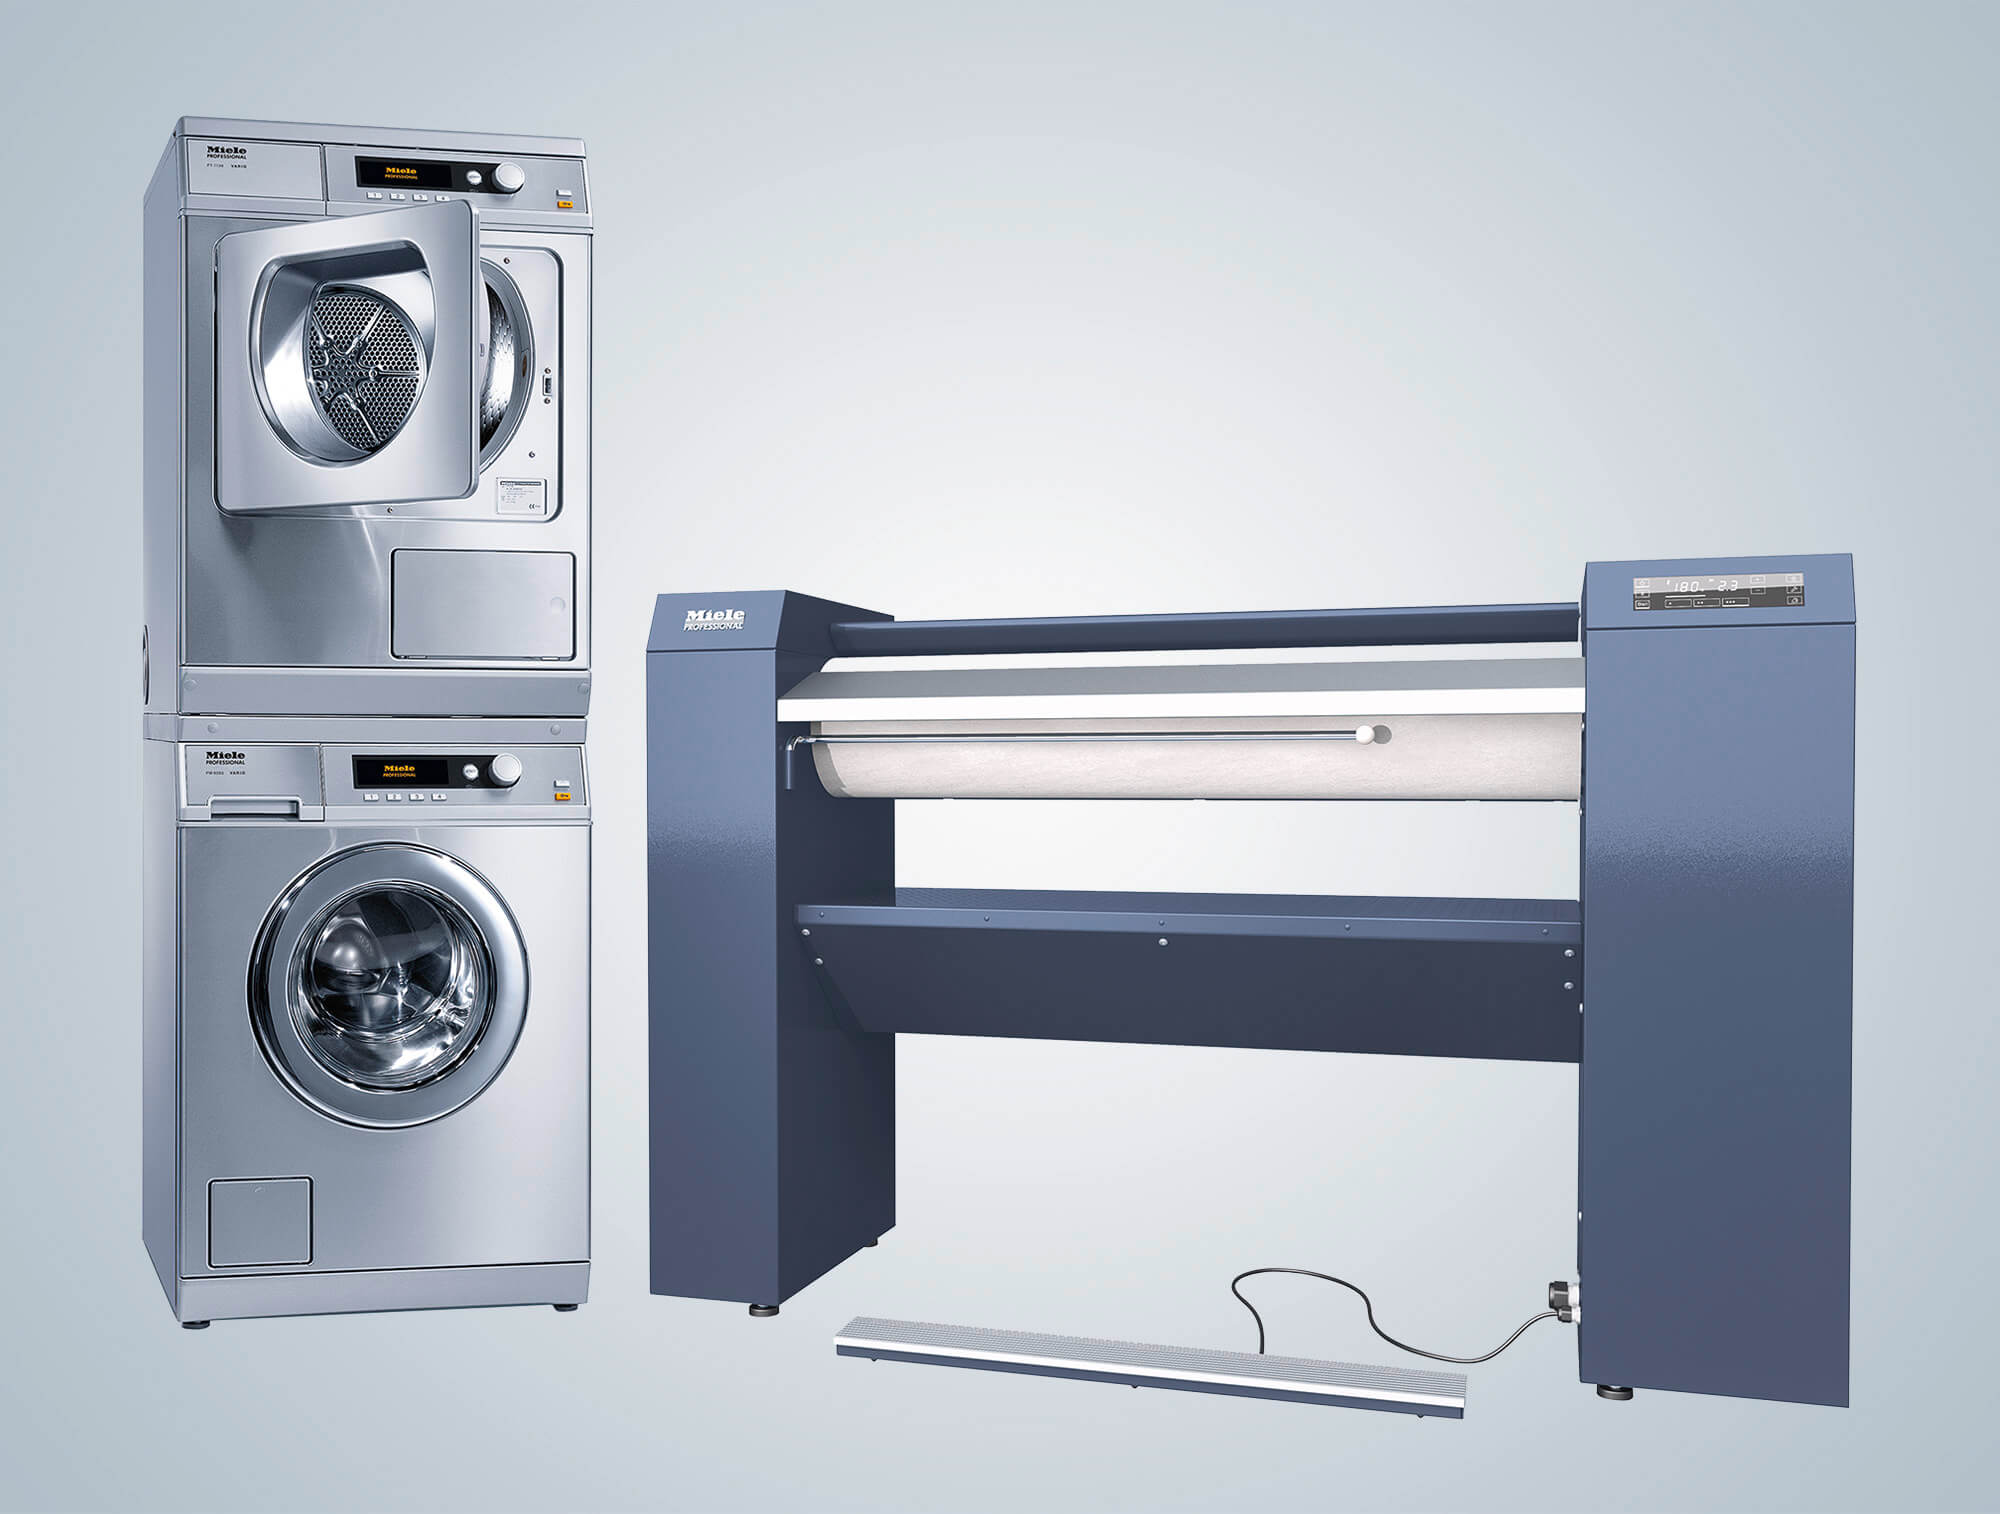 miele waschmaschine reparieren. Black Bedroom Furniture Sets. Home Design Ideas